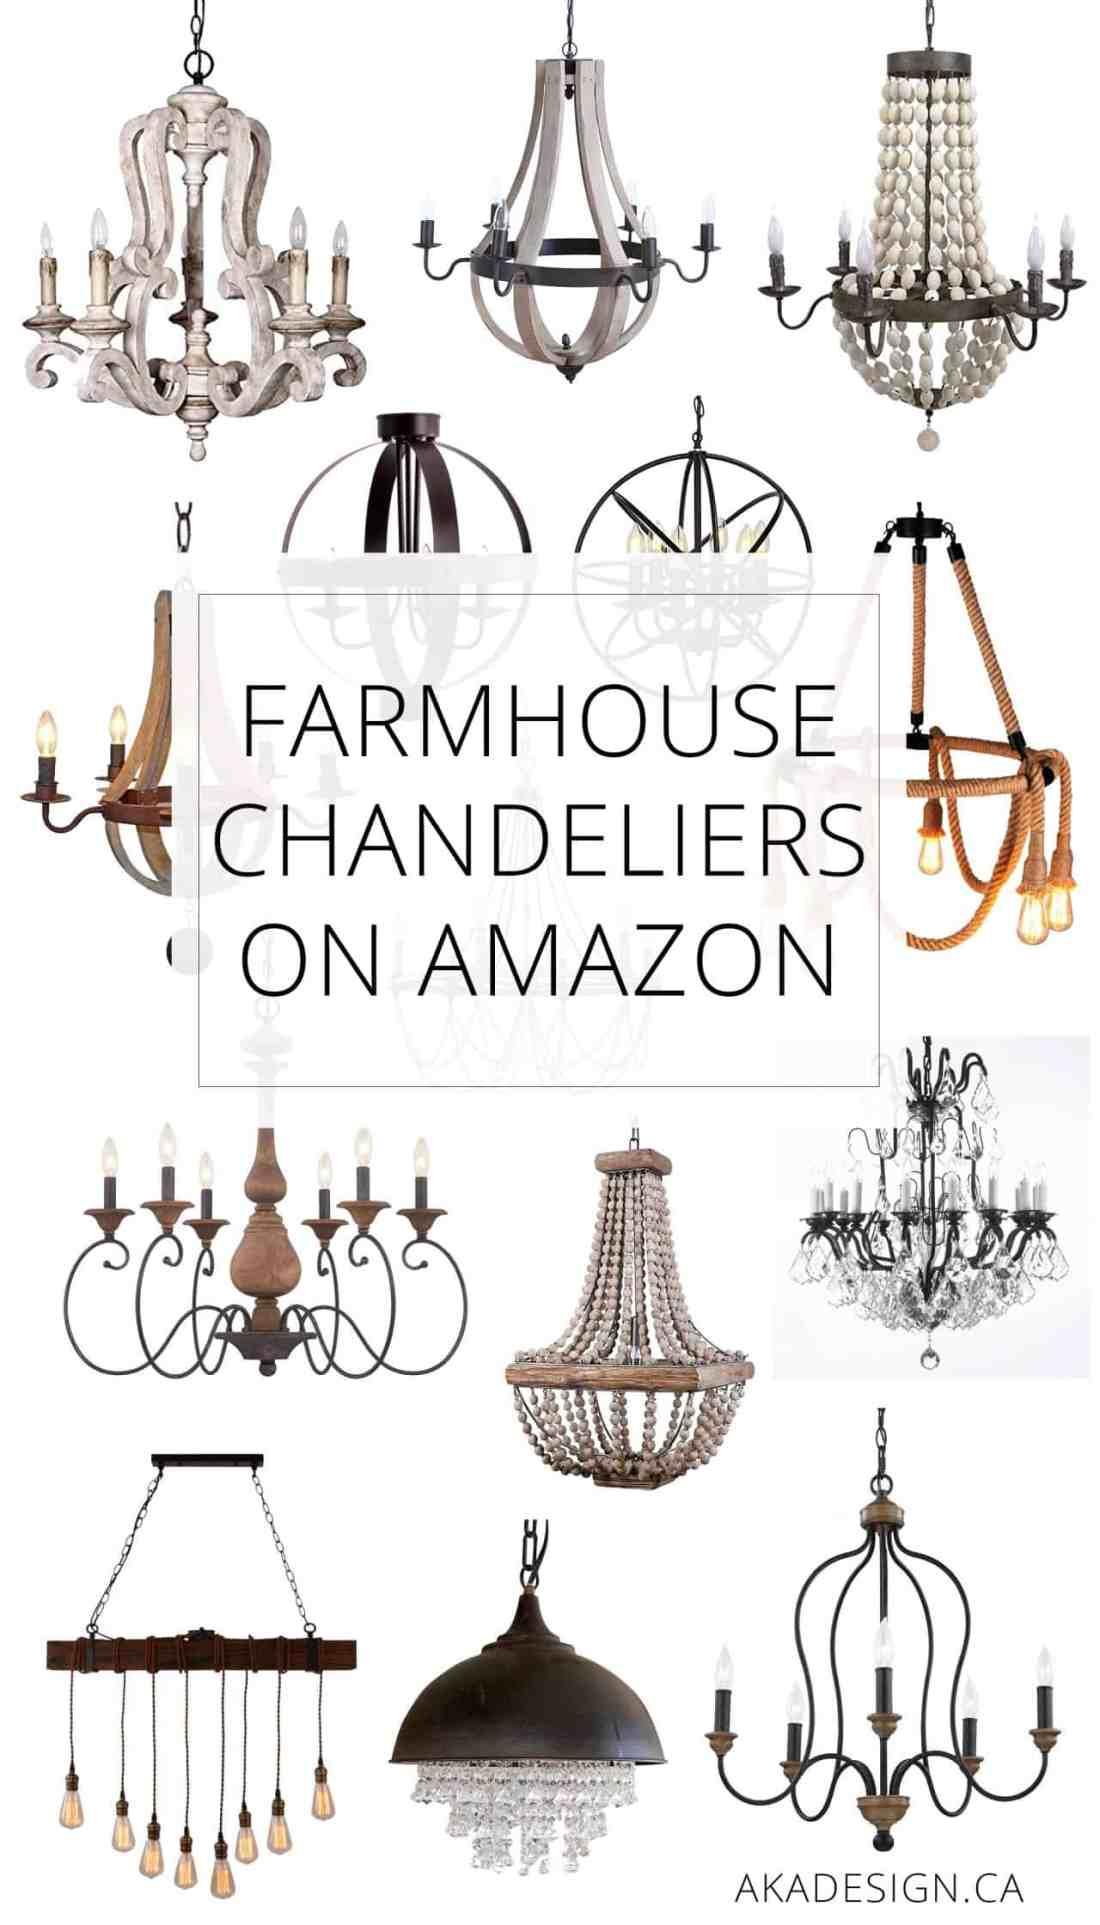 Farmhouse Chandeliers on Amazon